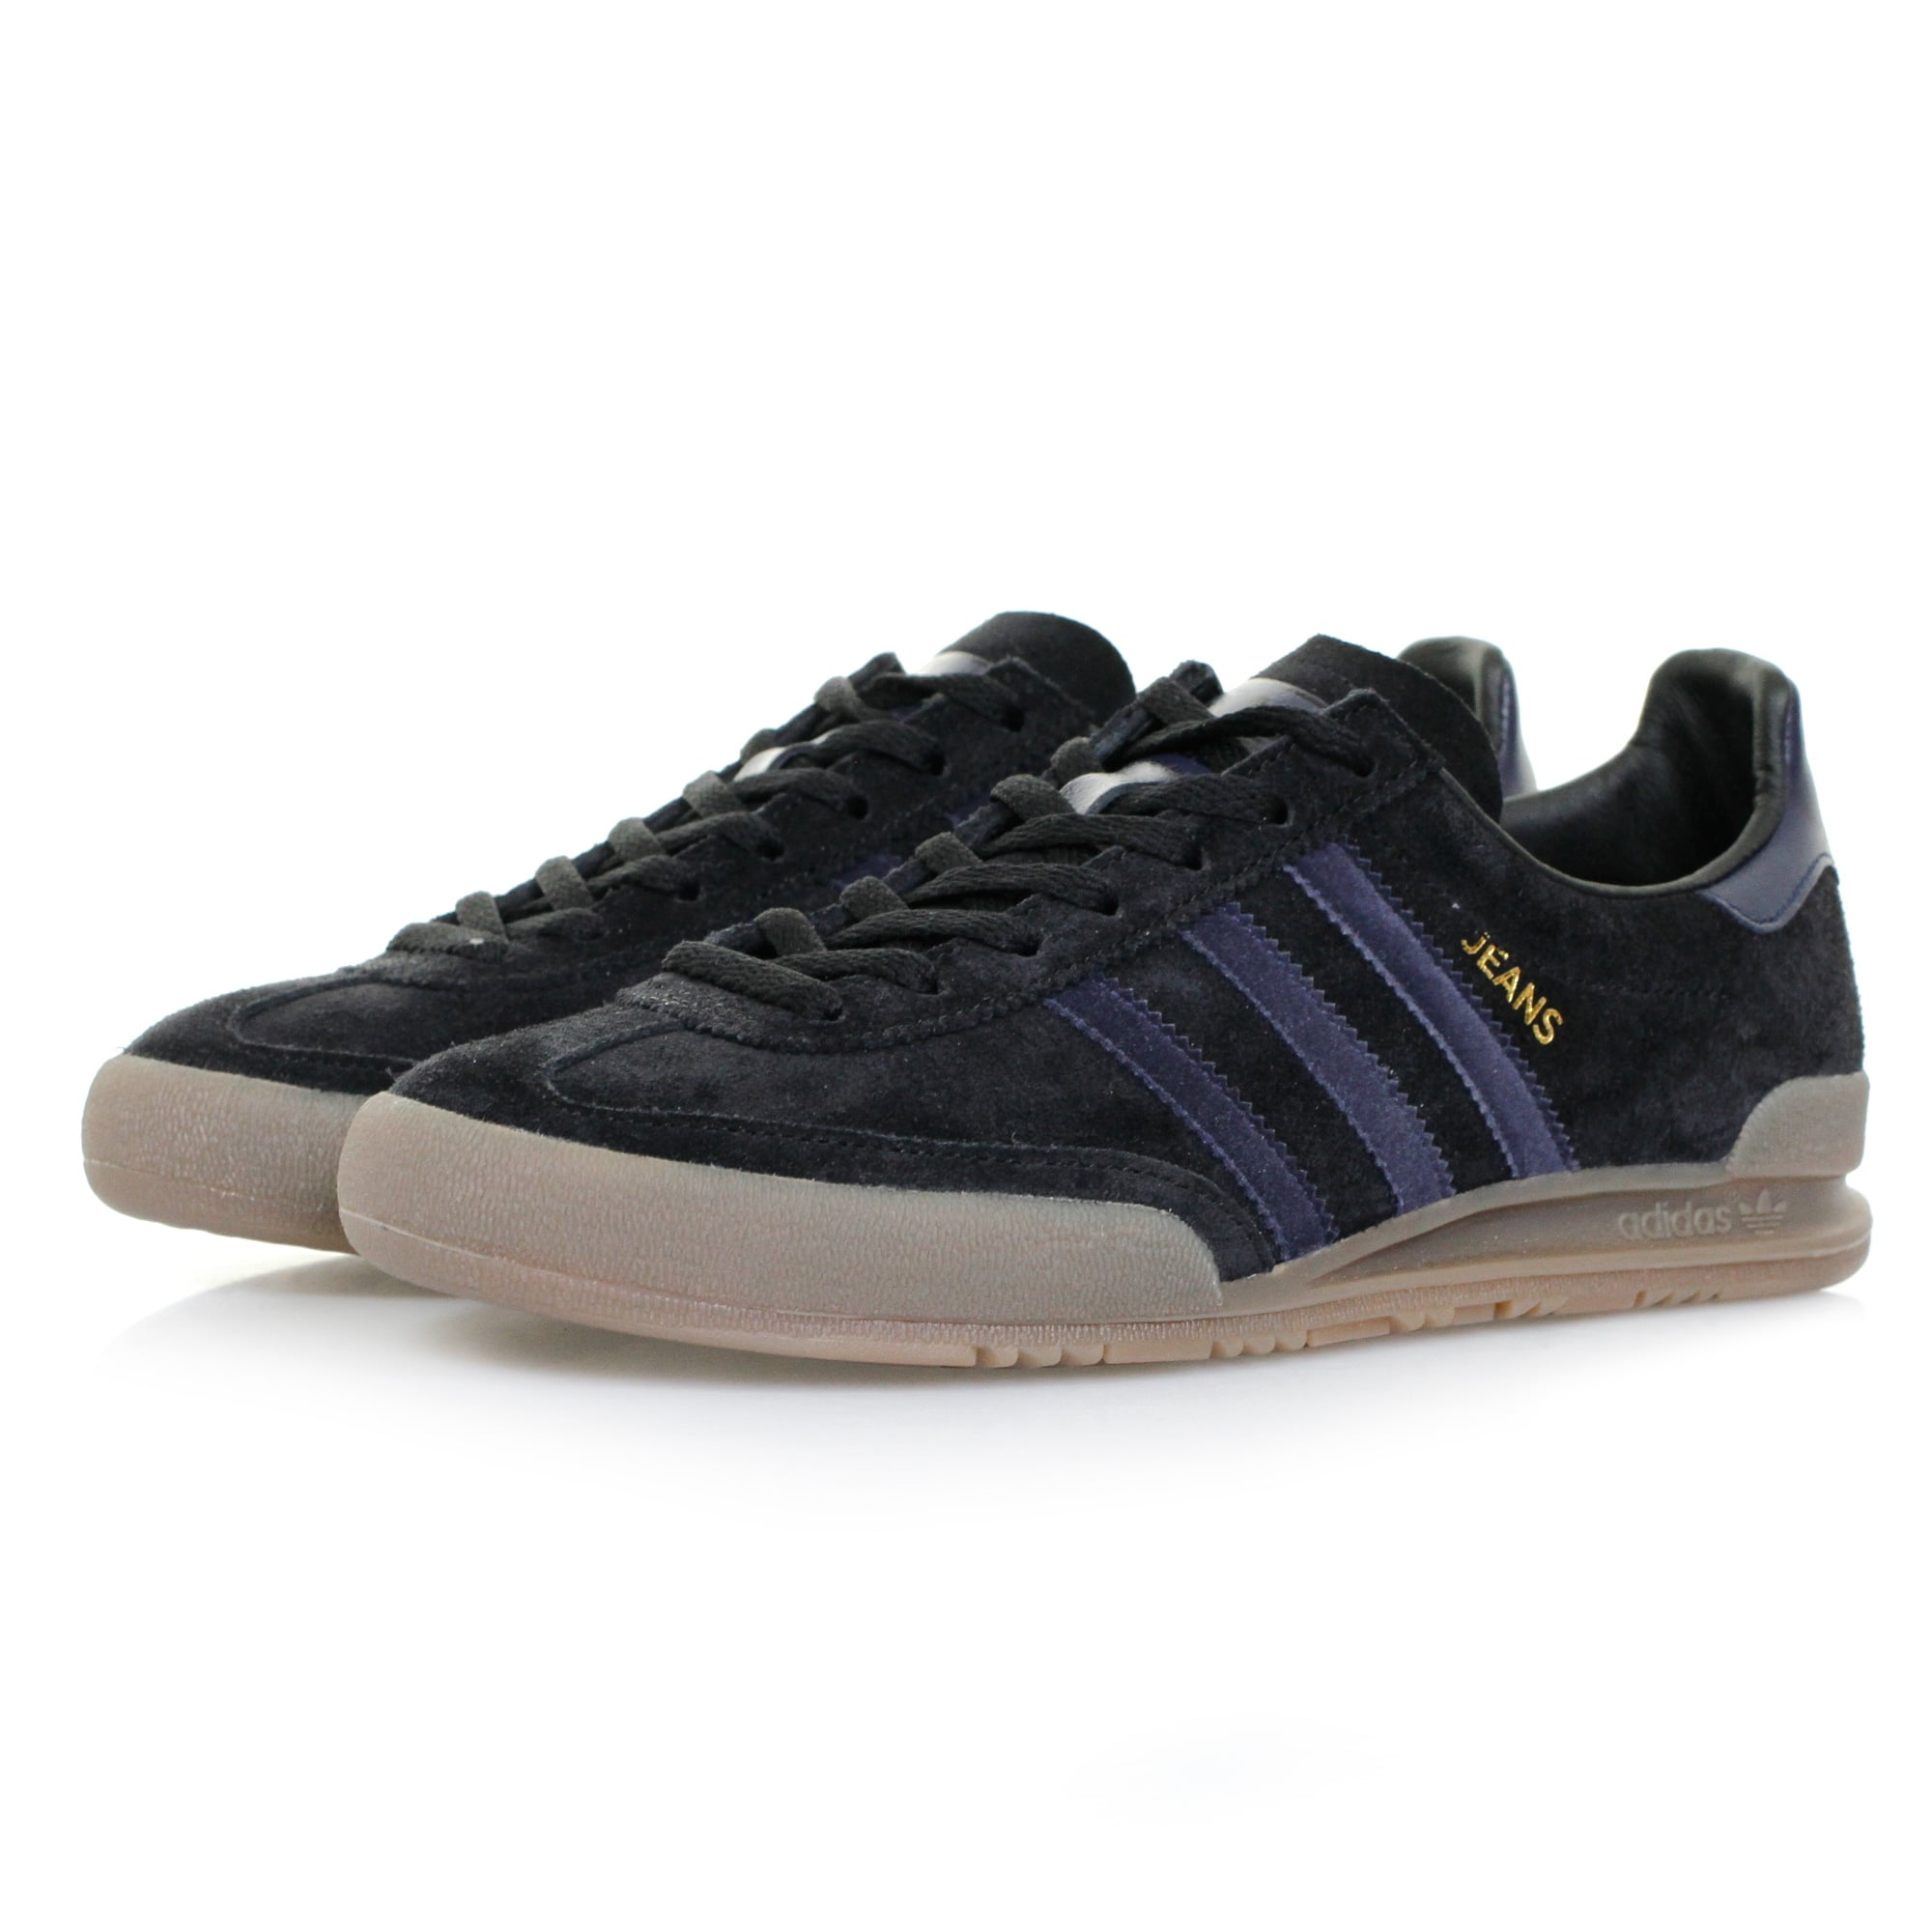 chaussure adidas en jean